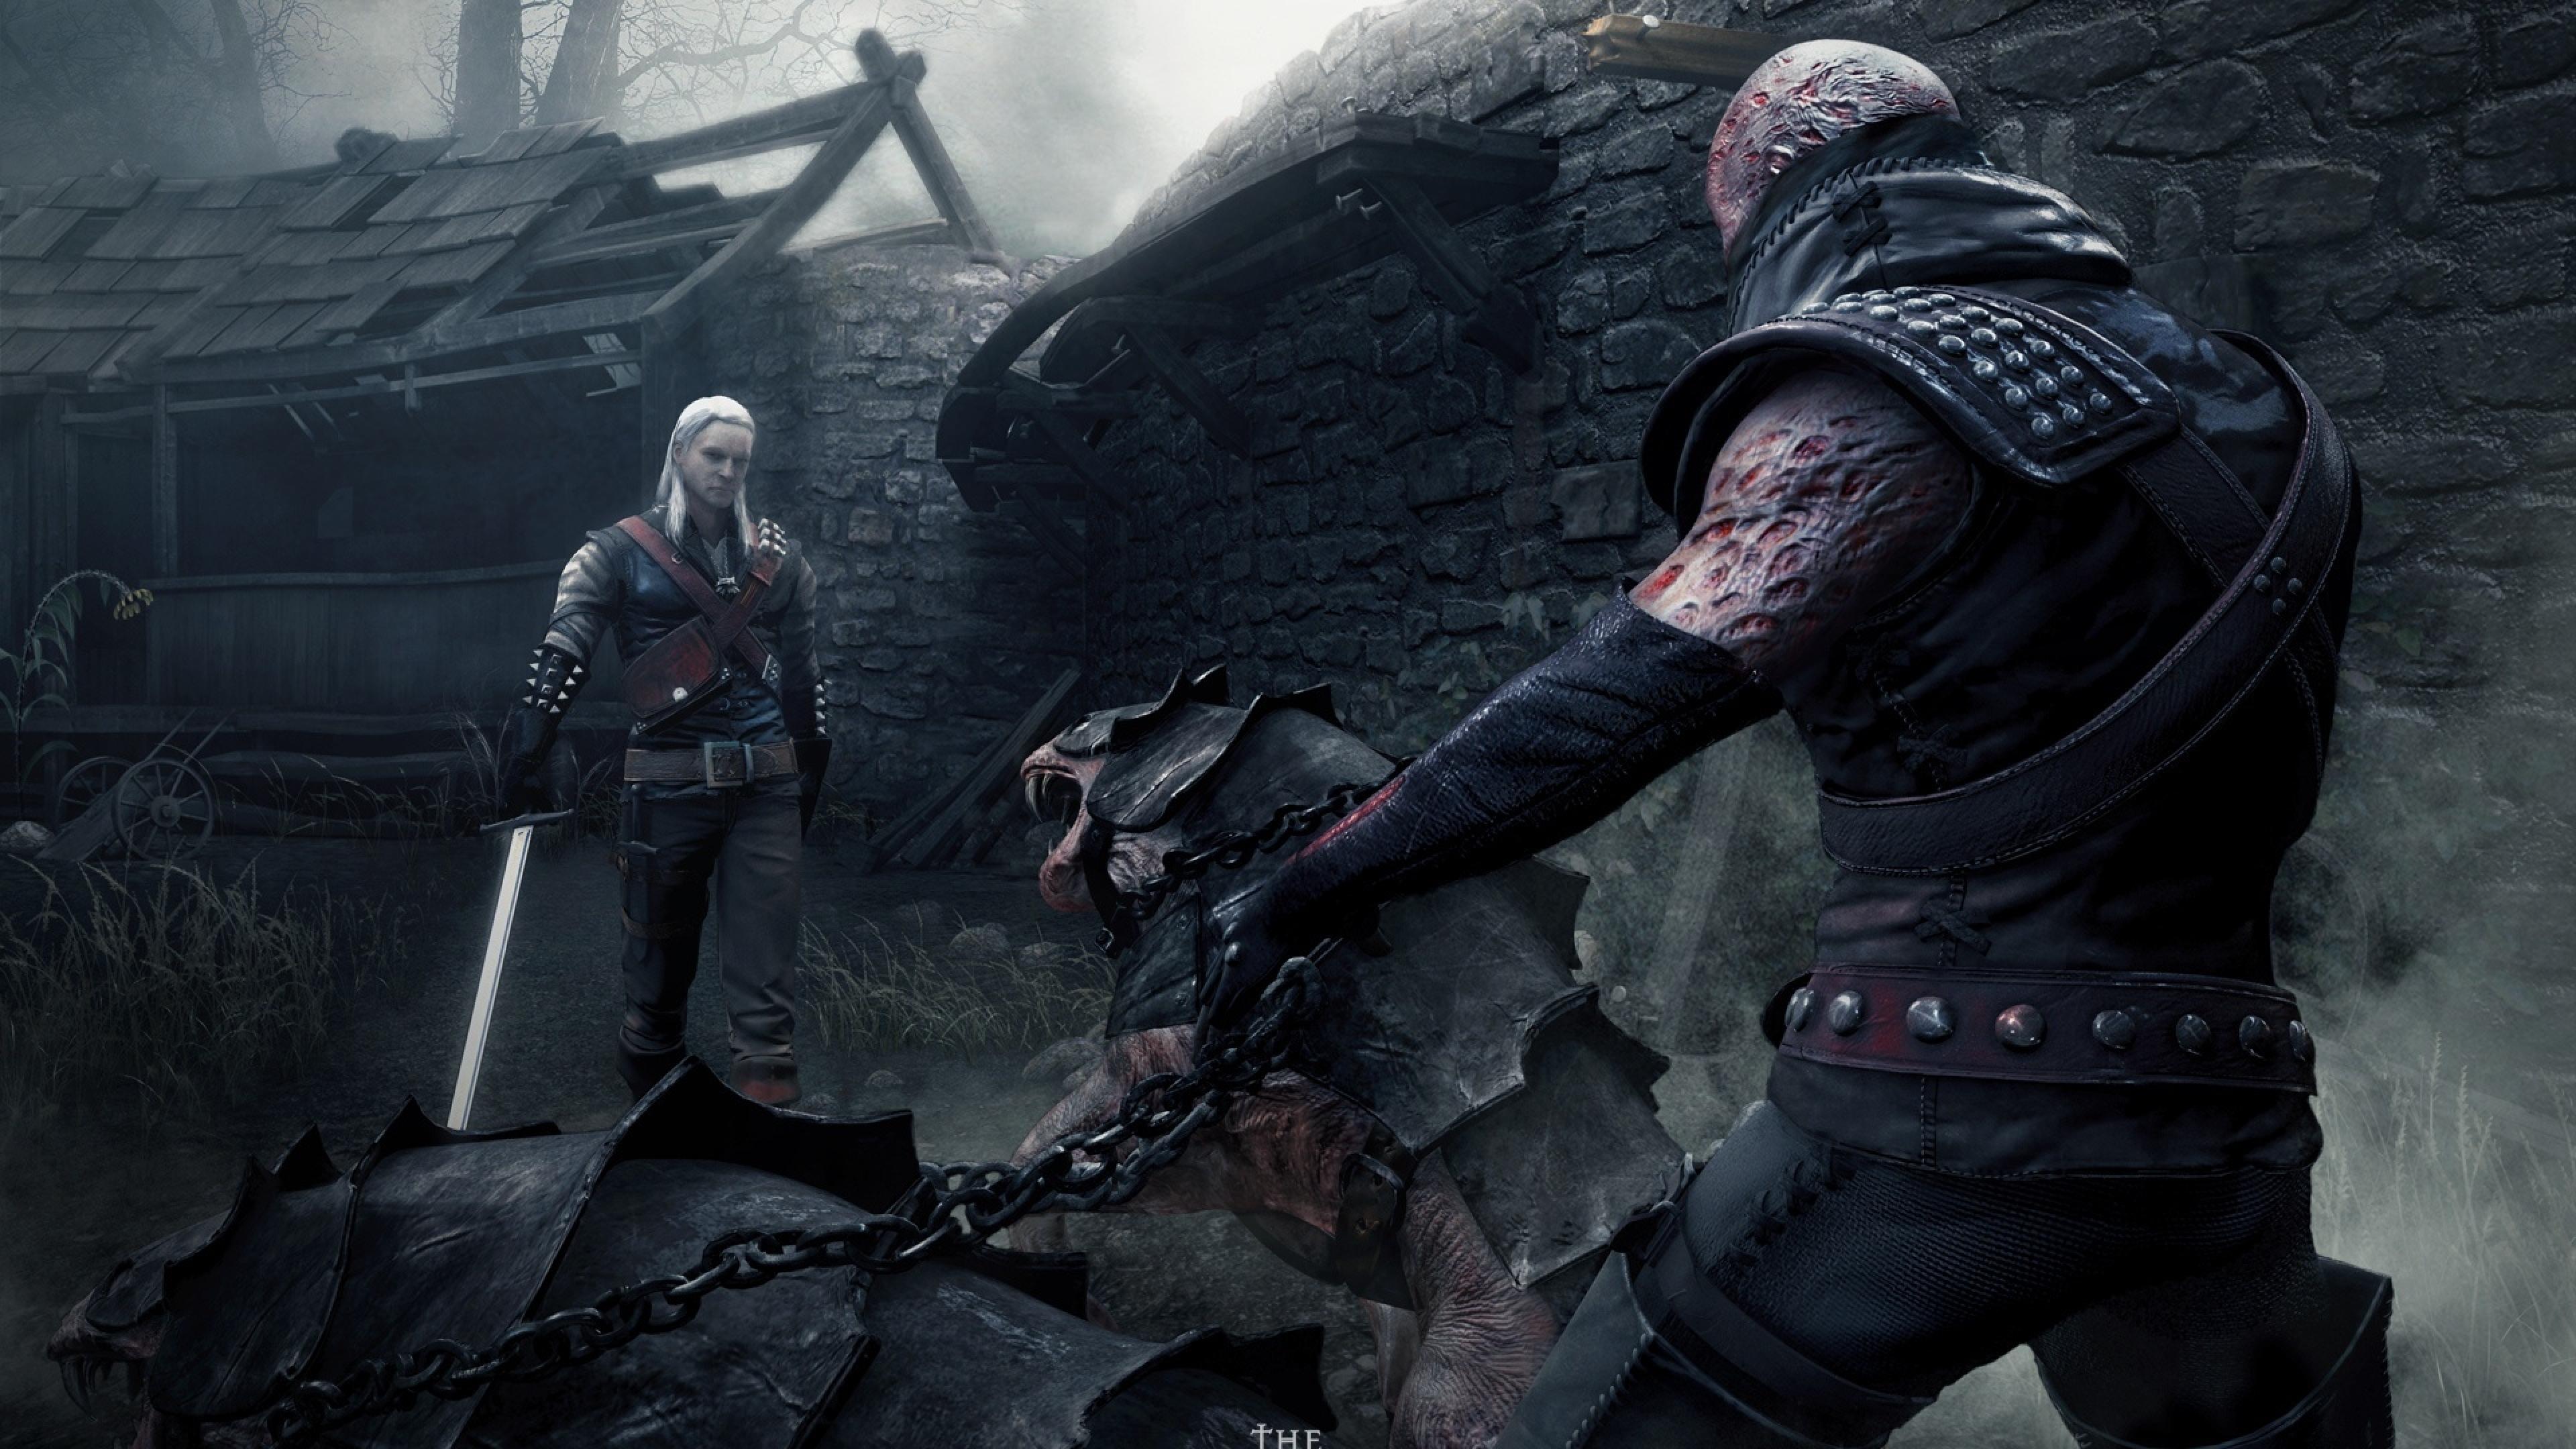 Witcher 3 4K Wallpaper